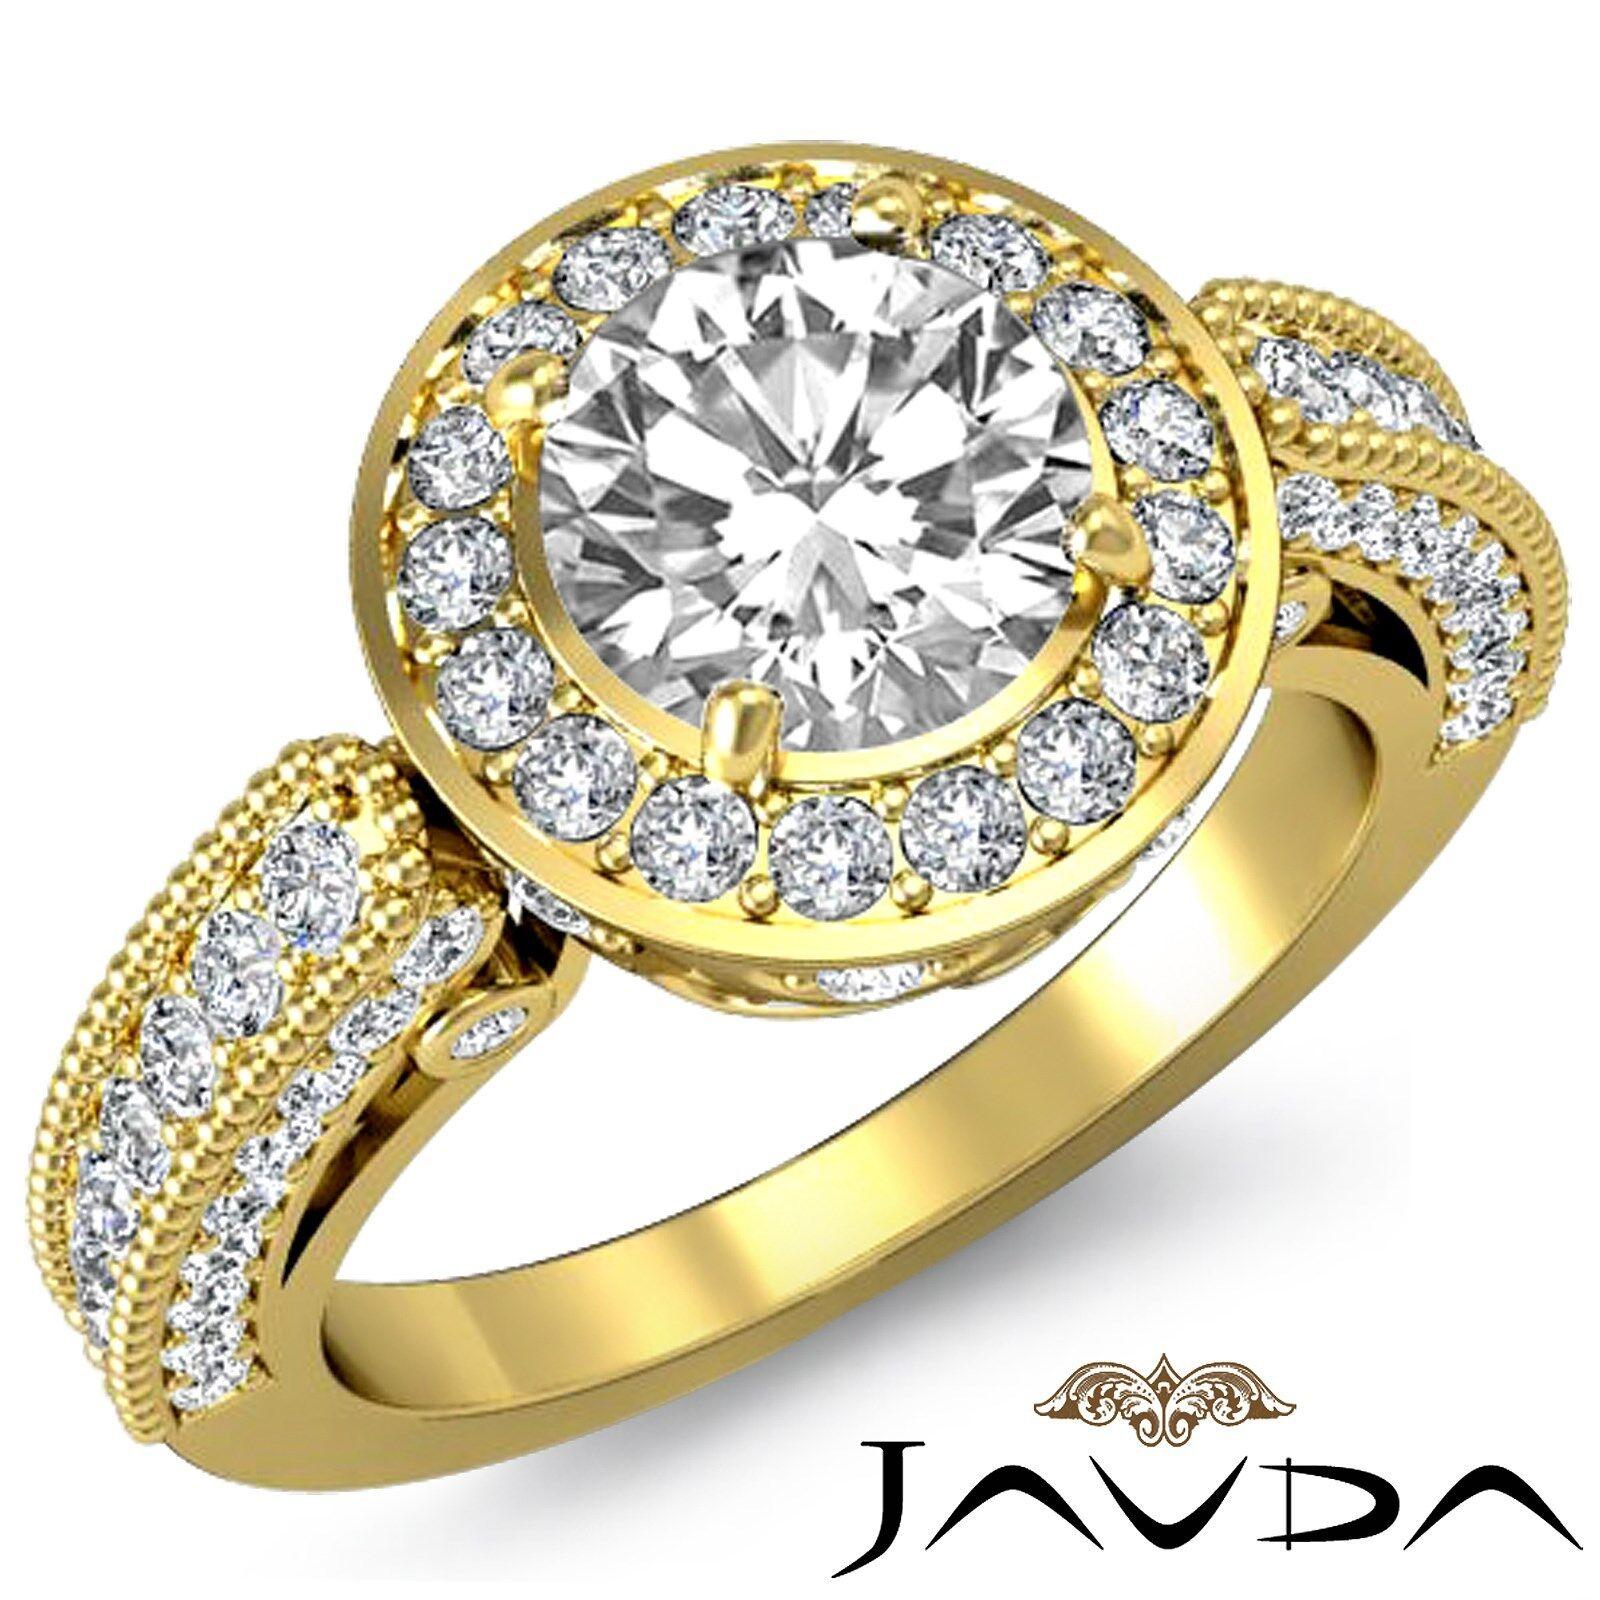 Milgrain Edge Halo Round Diamond Engagement Filigree Bezel Ring GIA F VS1 2.5Ct